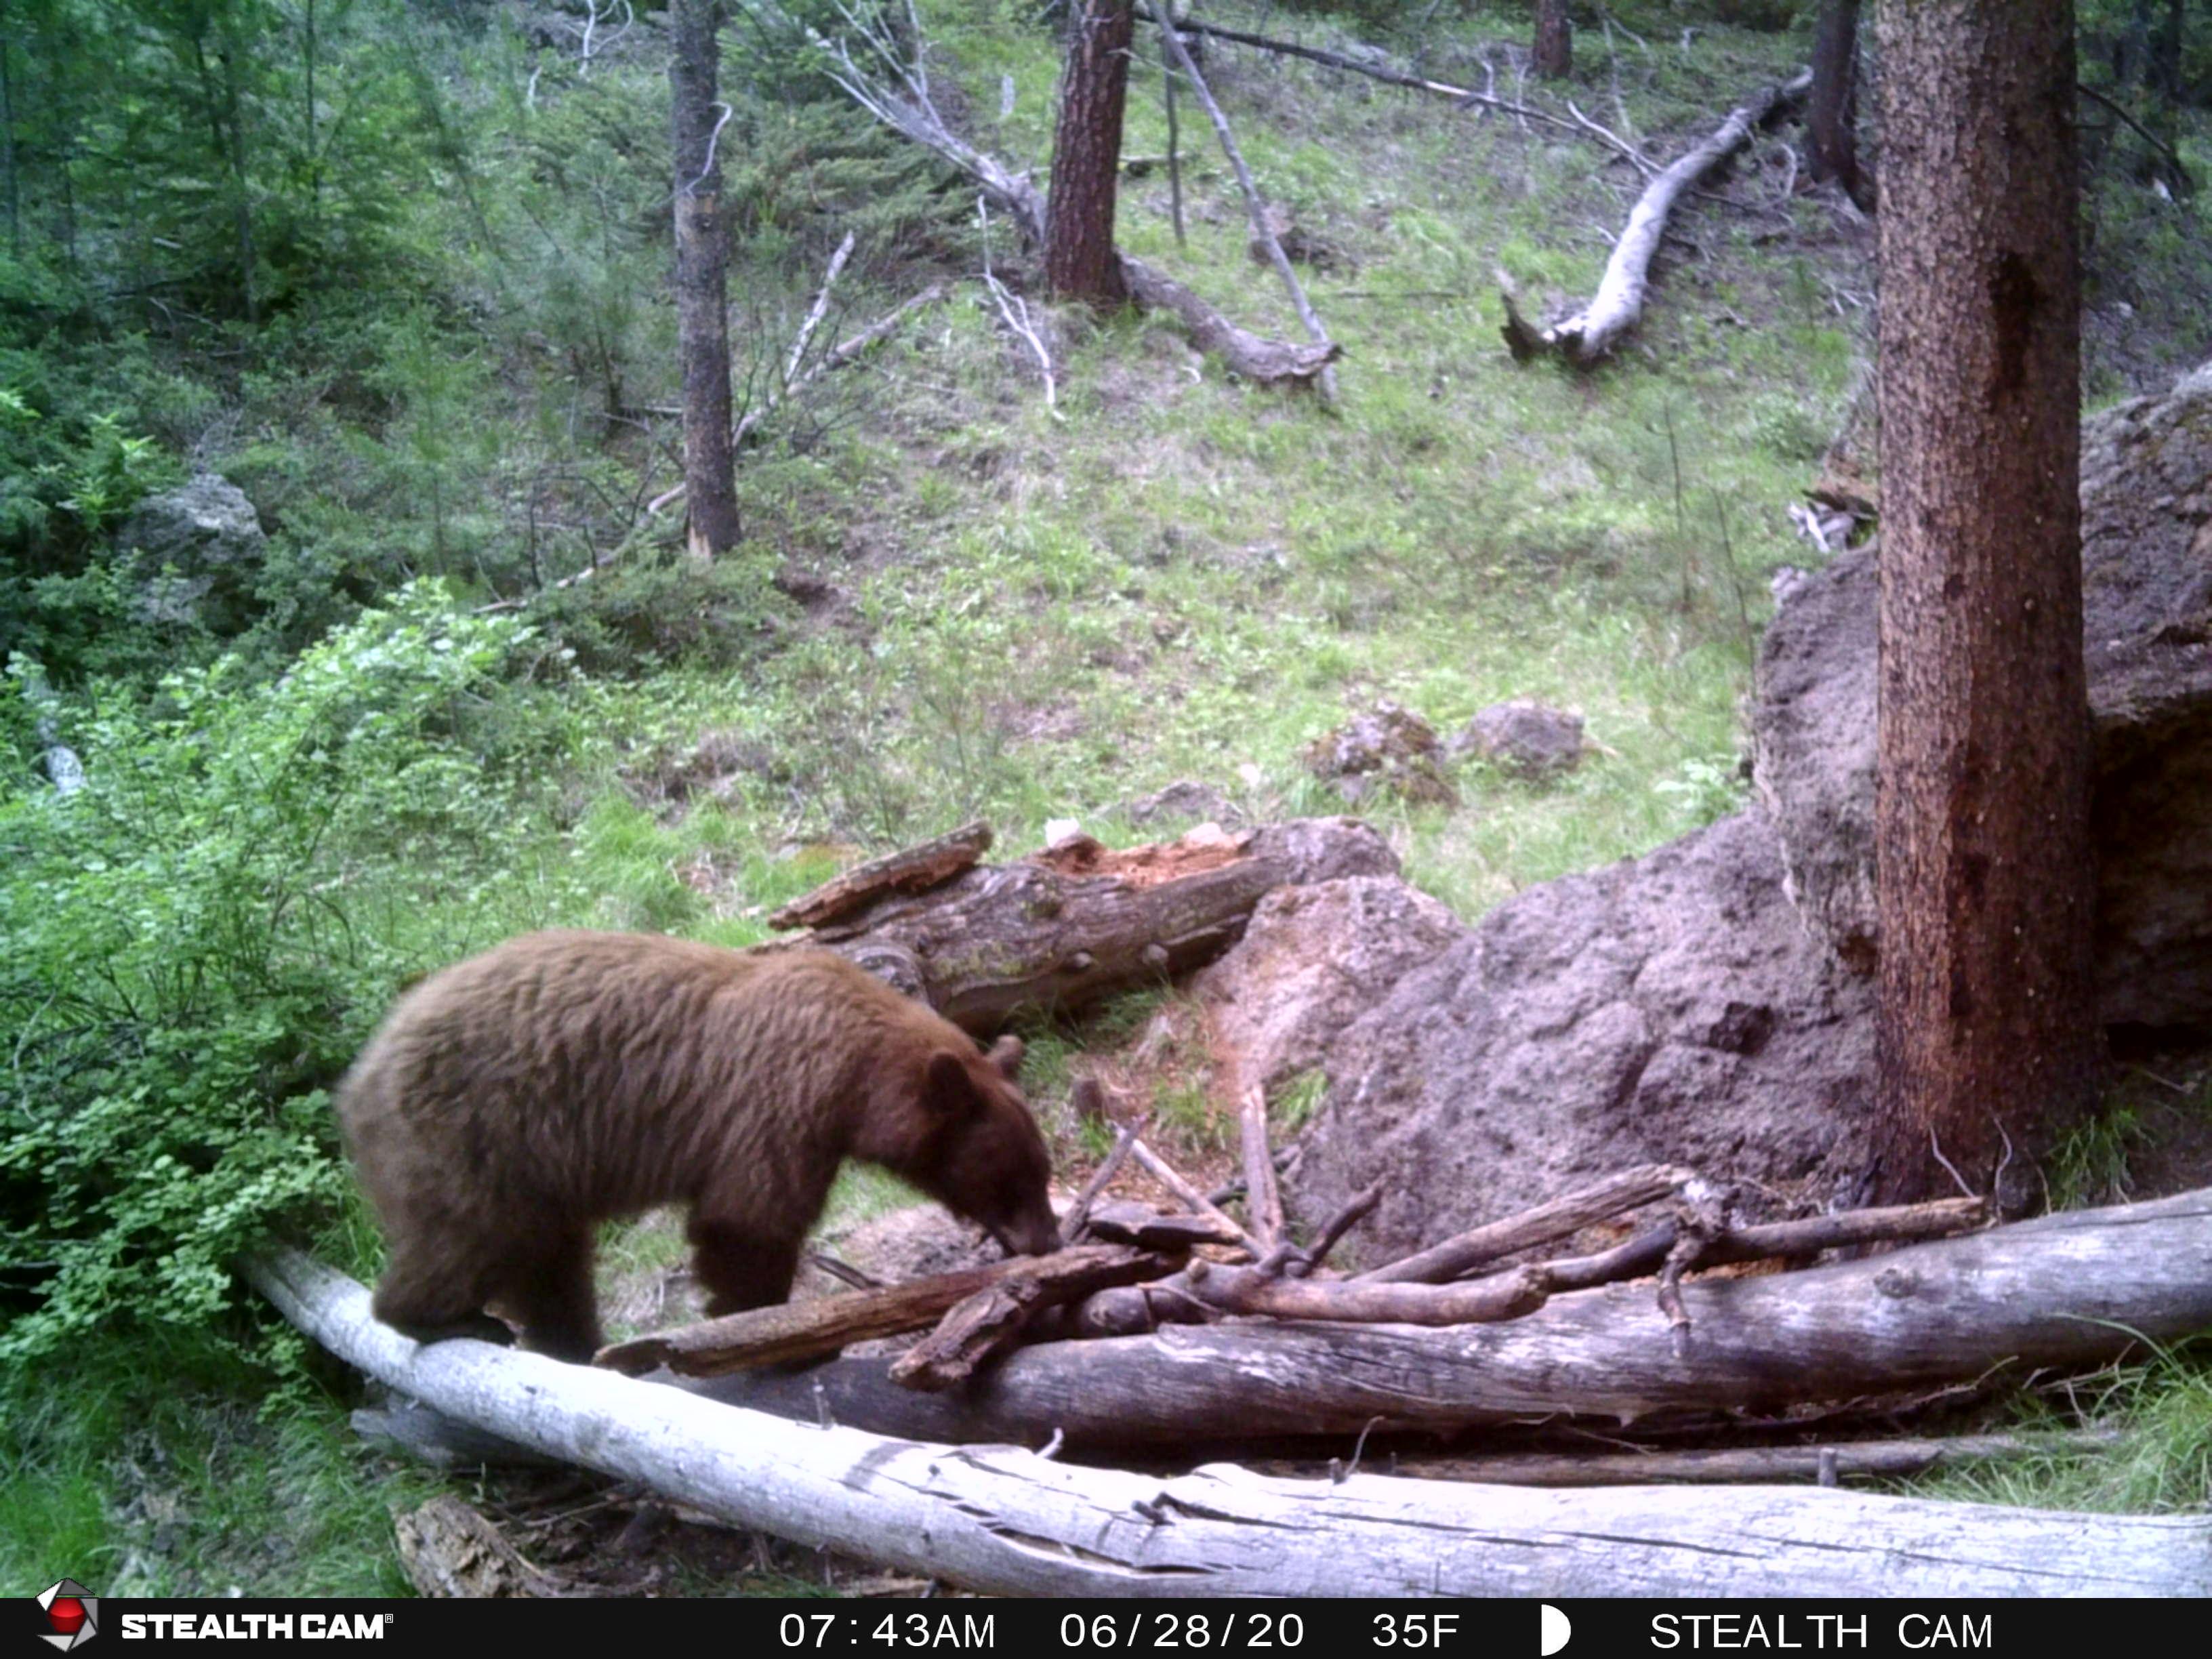 2020 Trail Cam image 2